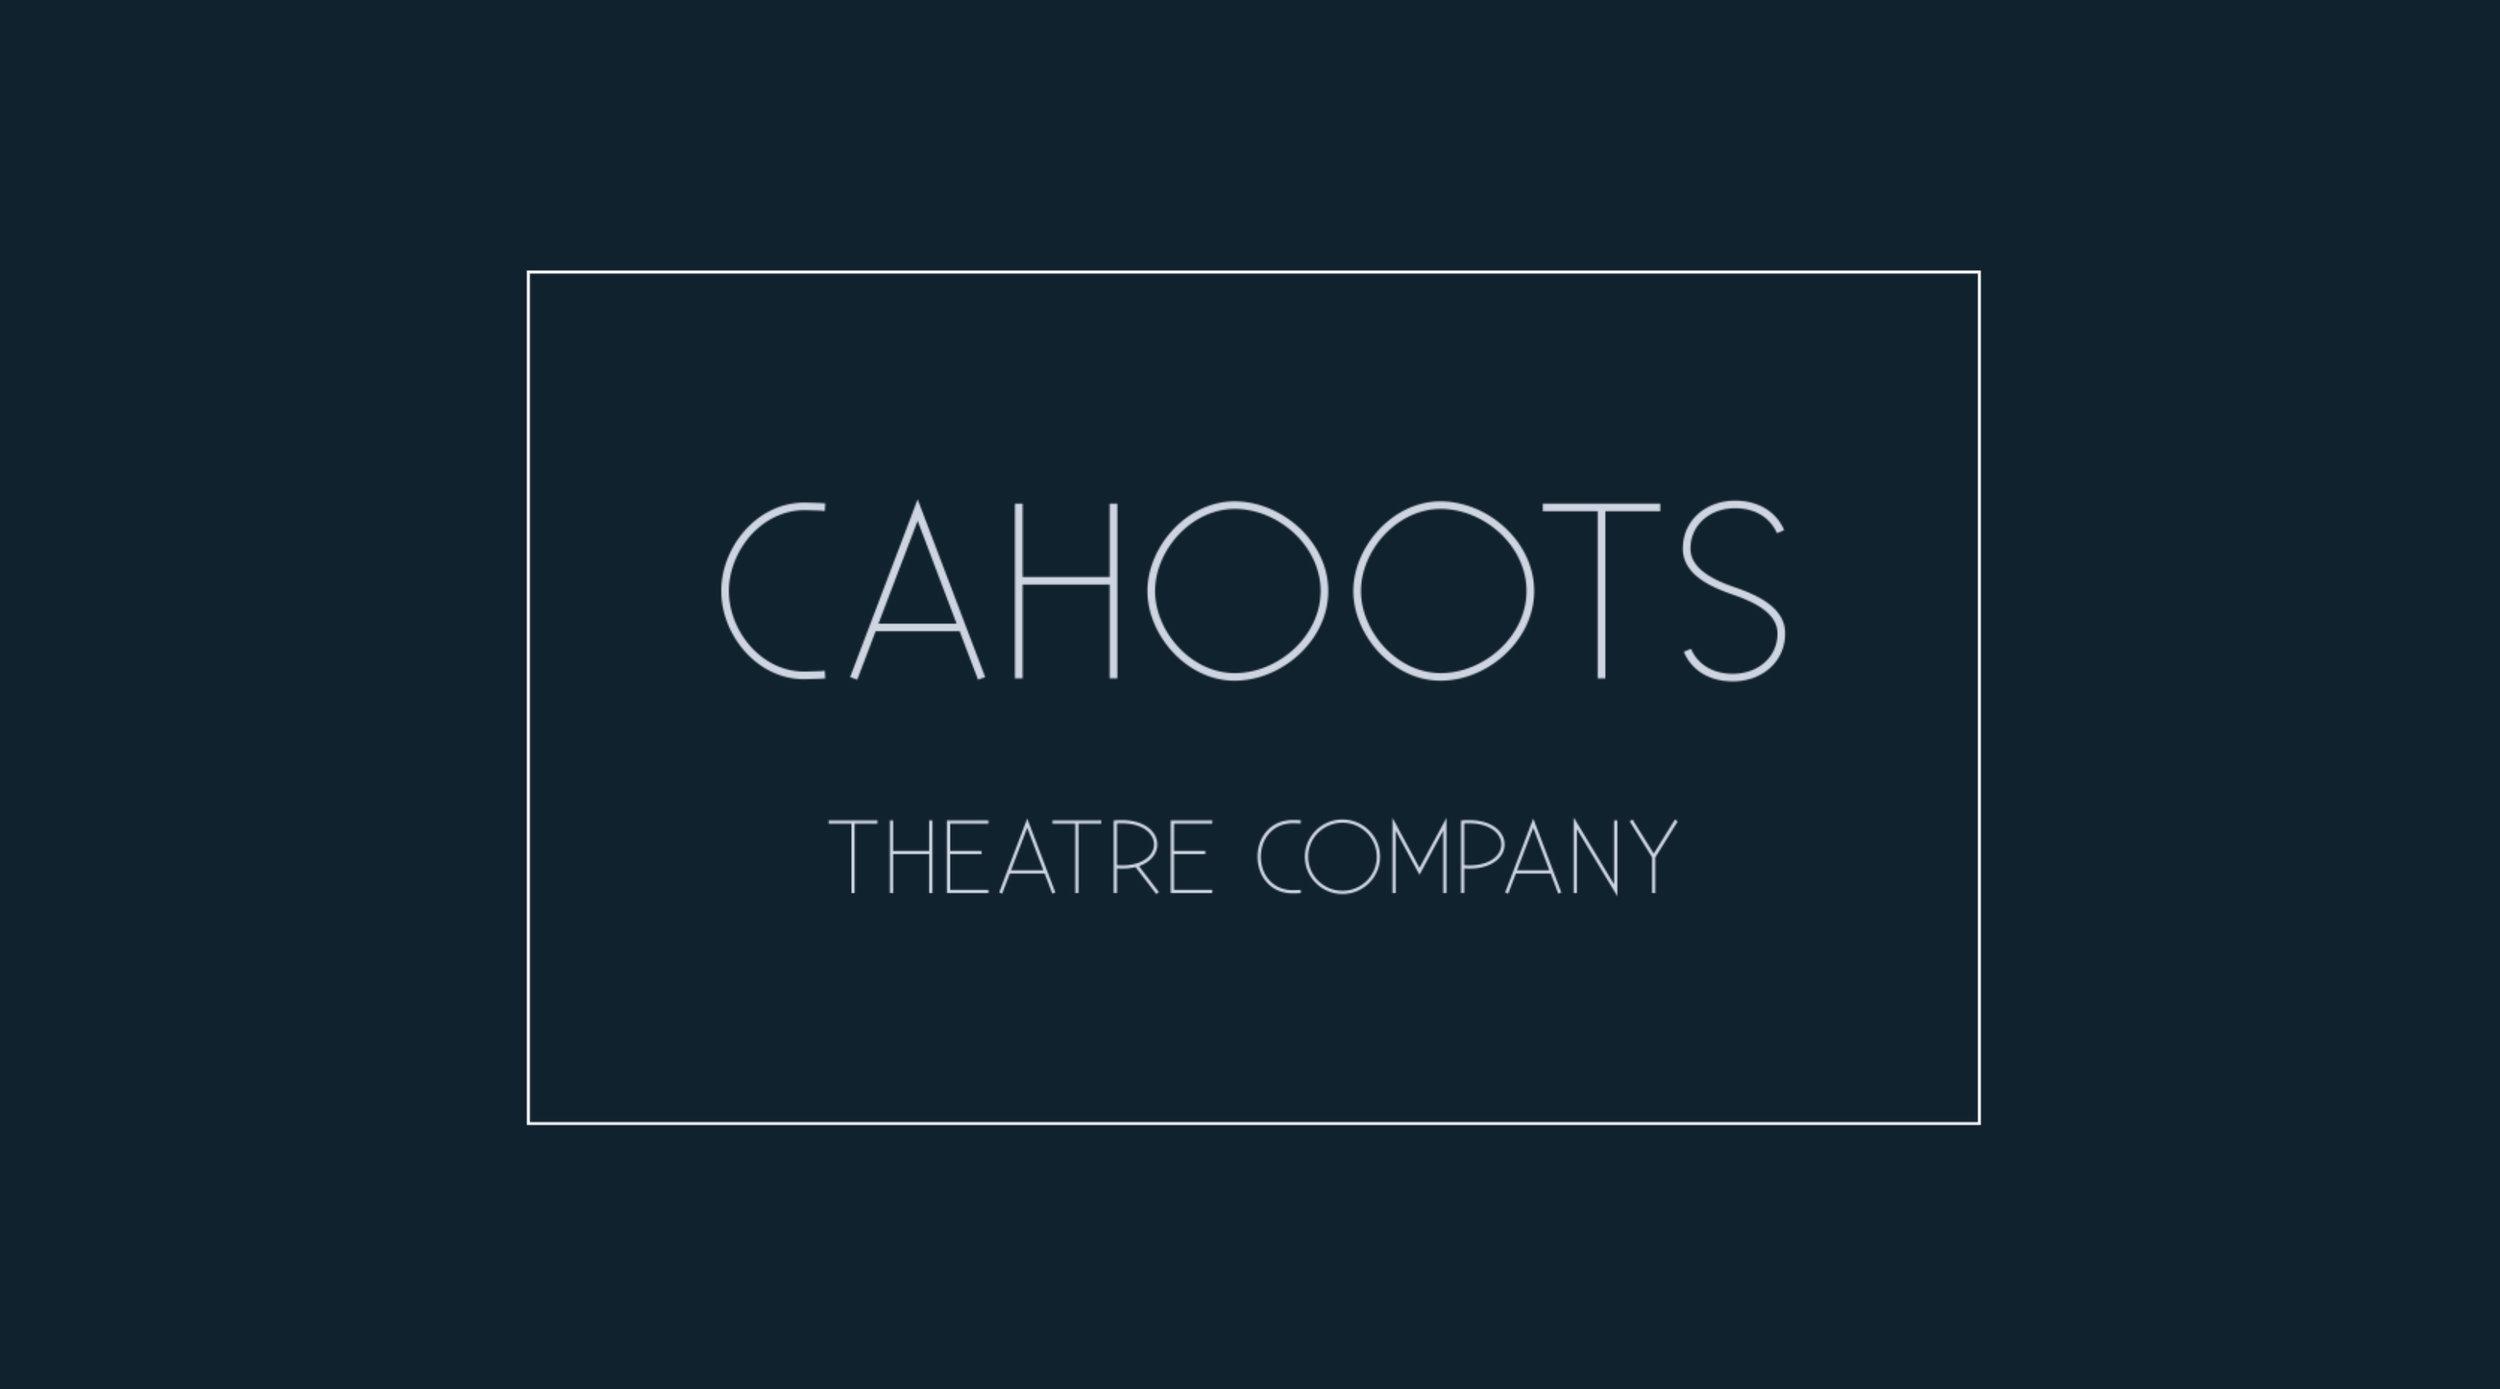 CAHOOTS.jpg